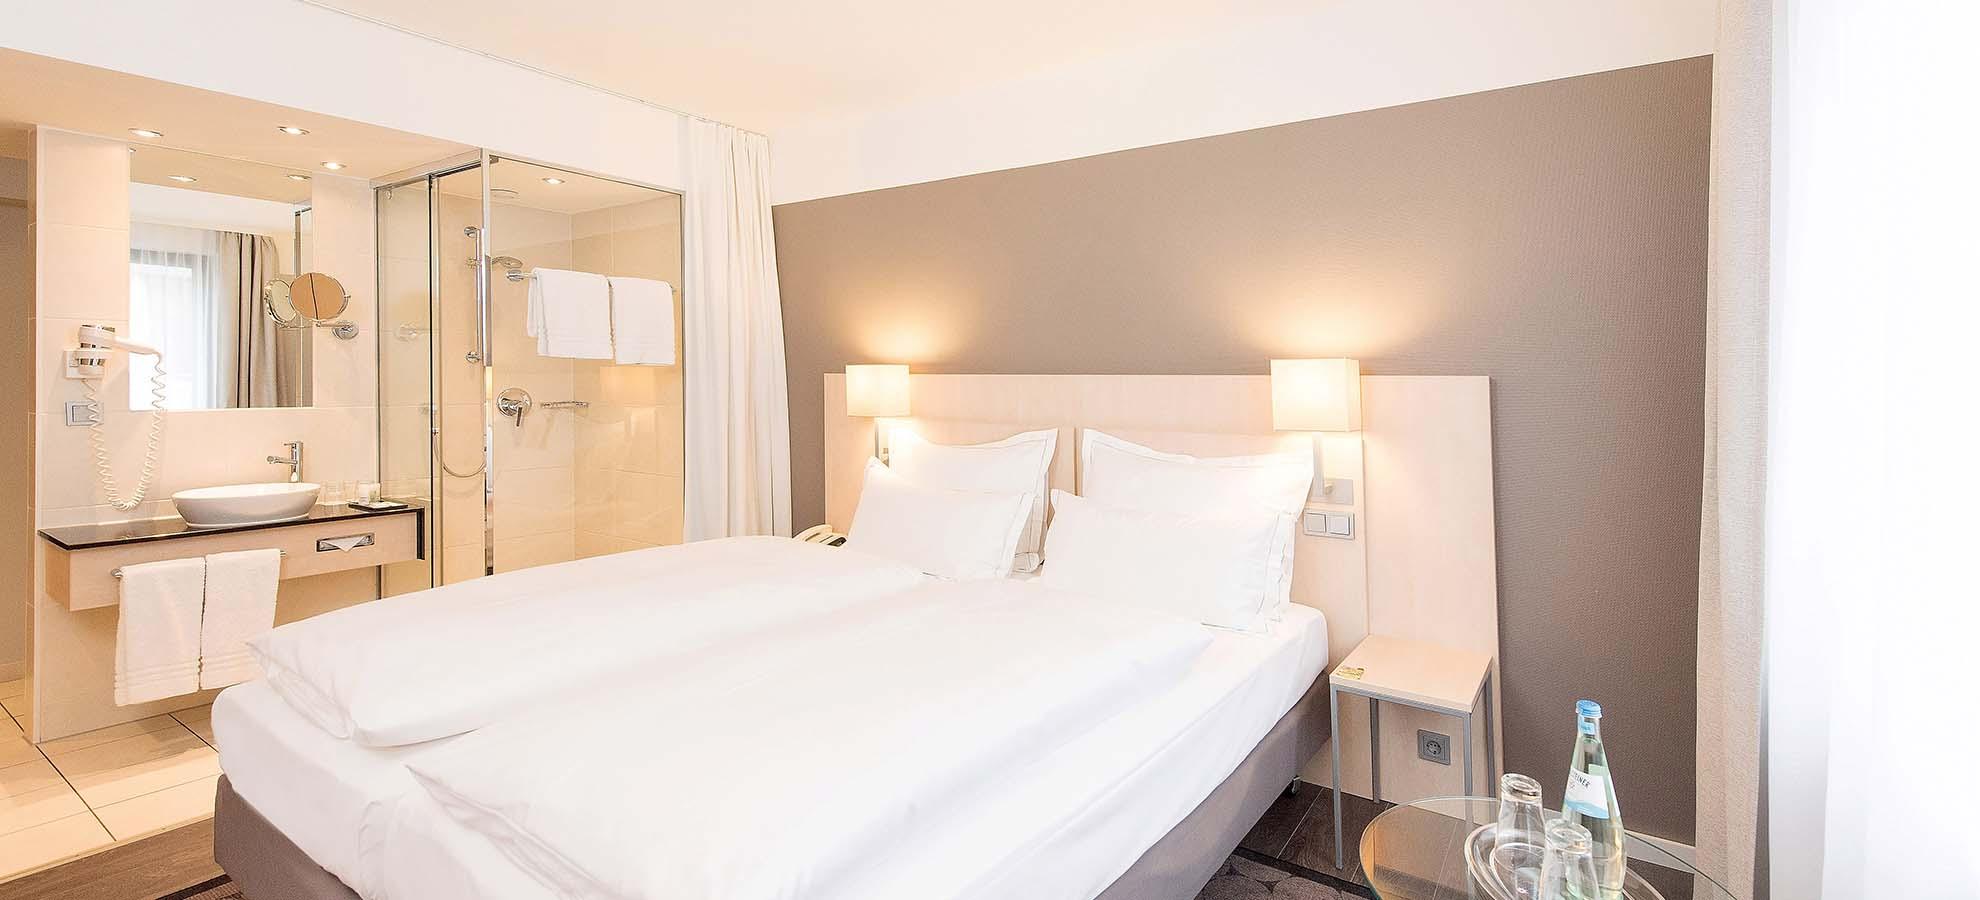 Hotel Lyskirchen Standard Zimmer / Standard Room